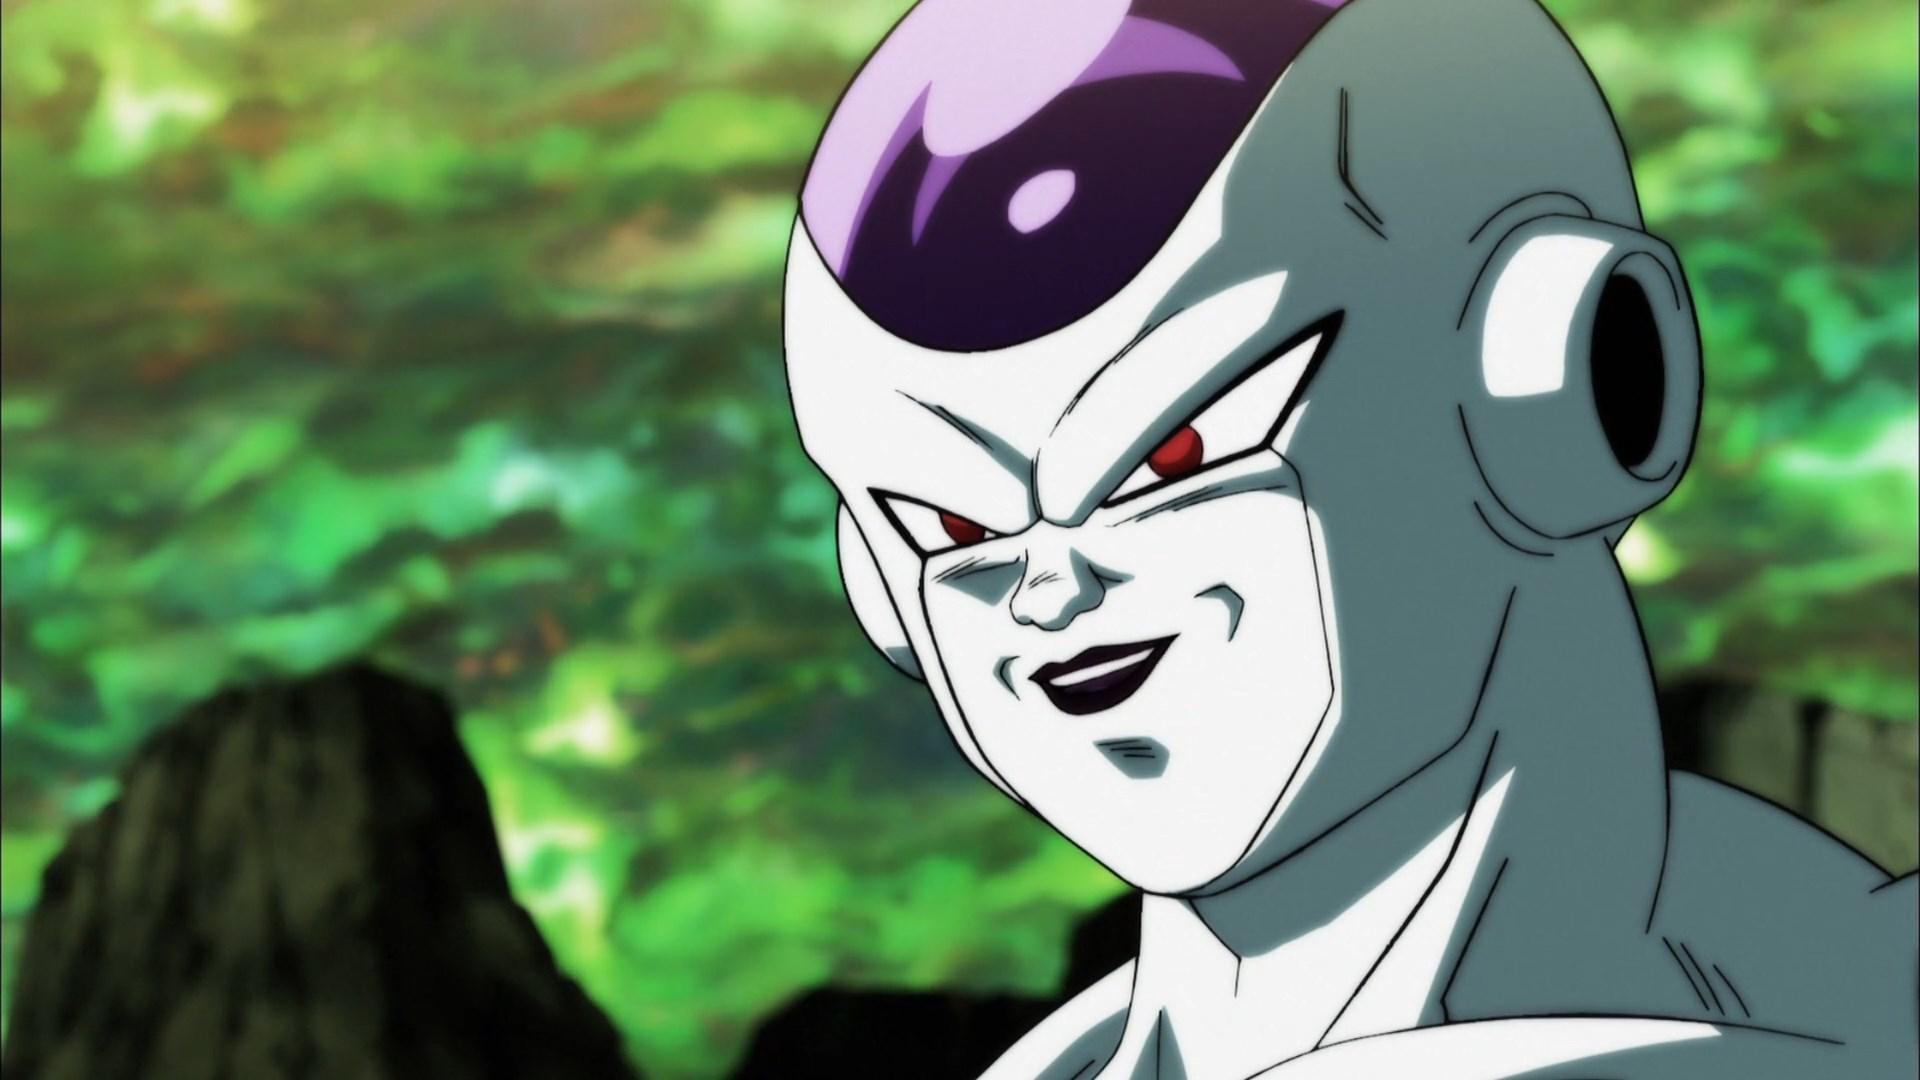 [HorribleSubs] Dragon Ball Super - 121 [1080p].mkv_snapshot_05.33